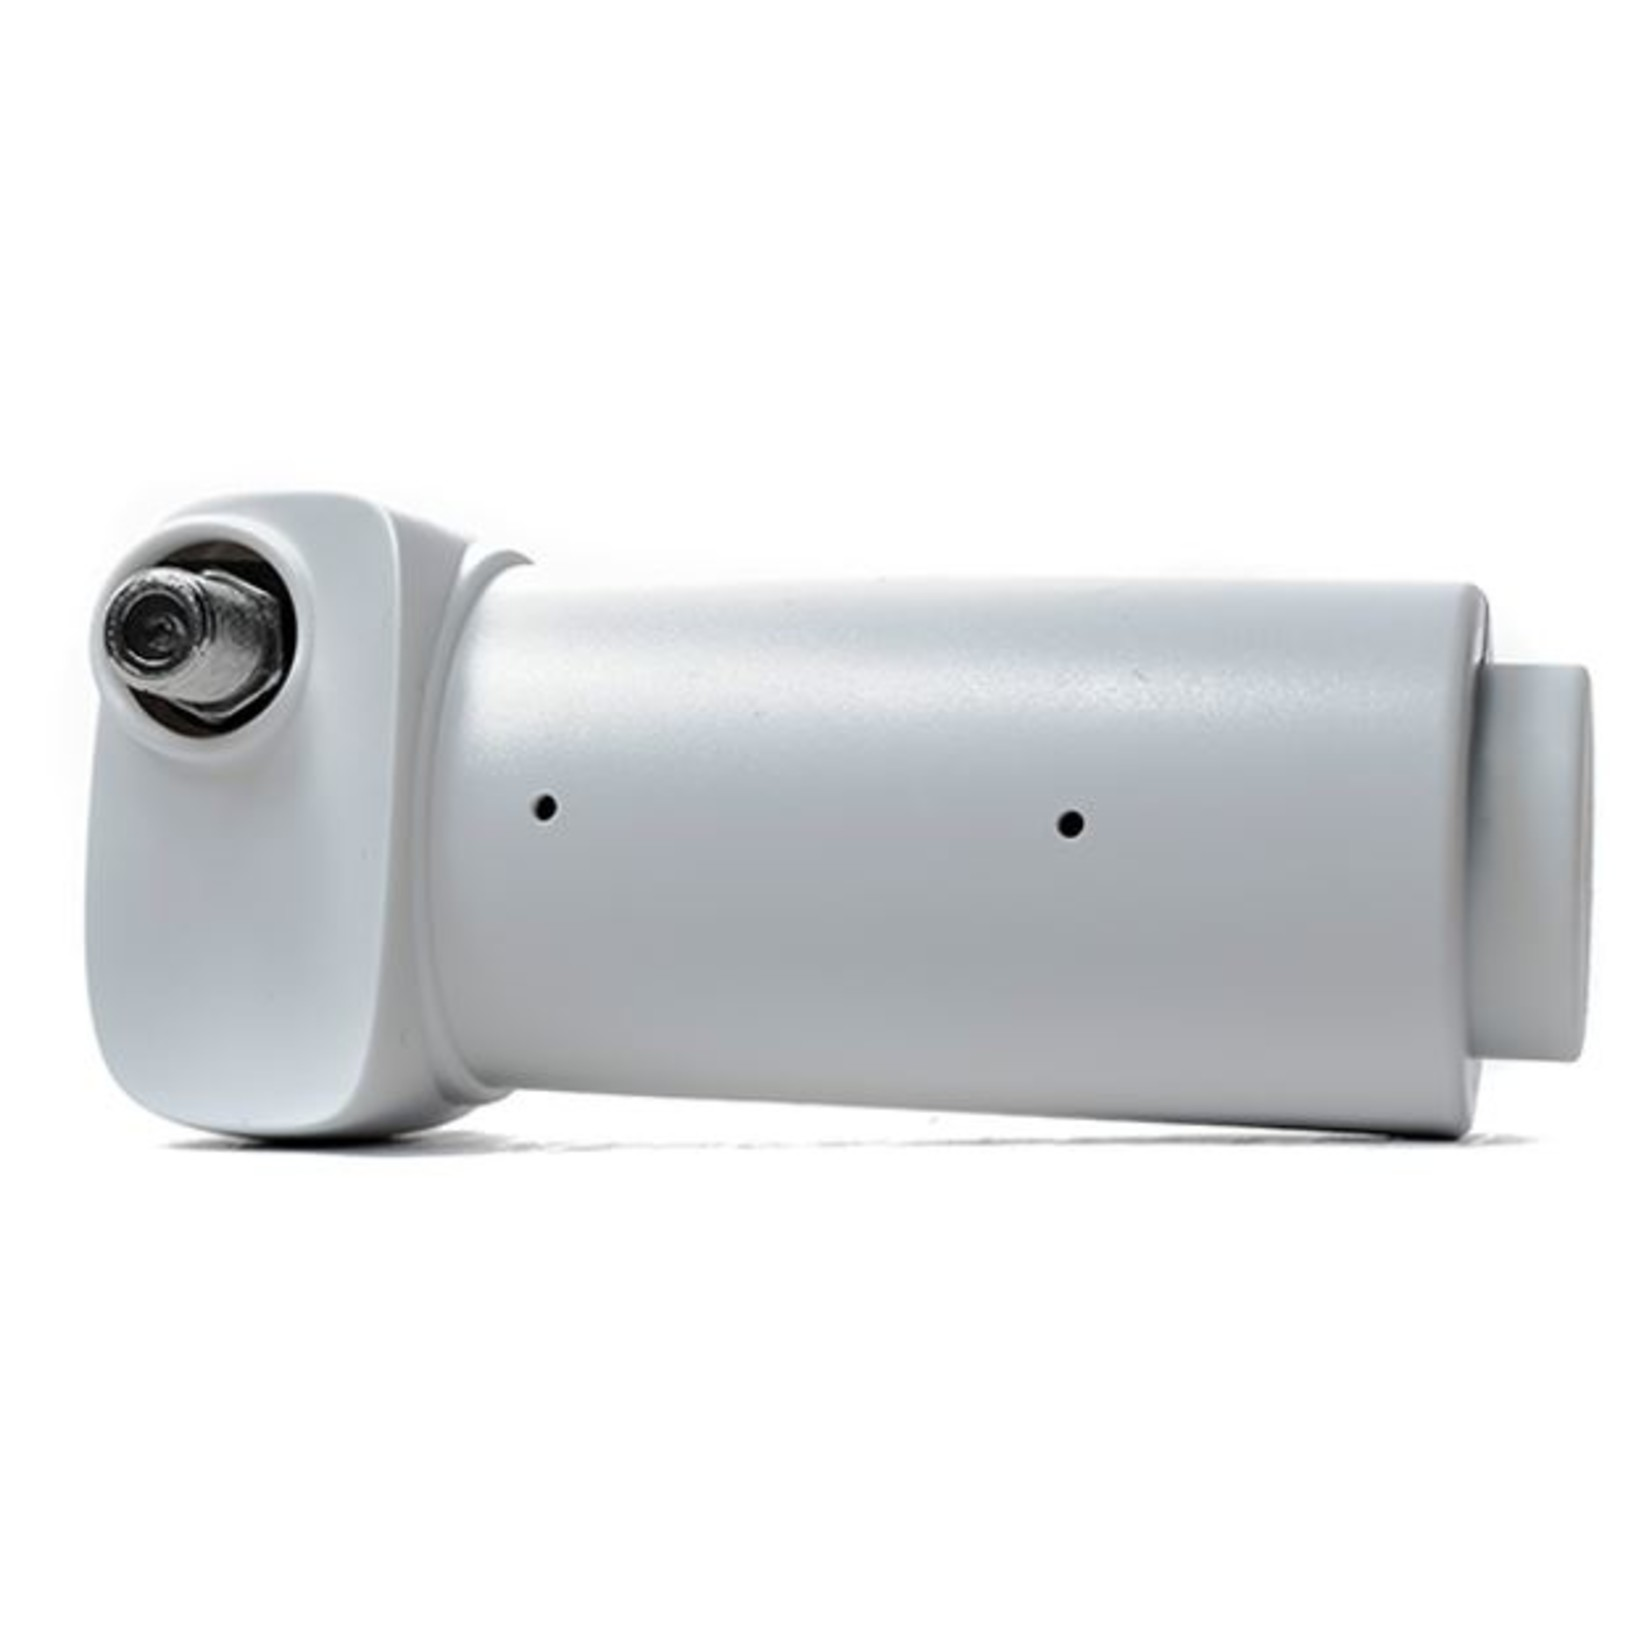 RELOOK LNB RELOOK SINGLE SLIM FEED EASY CONNECT 40 mm - 0.1db